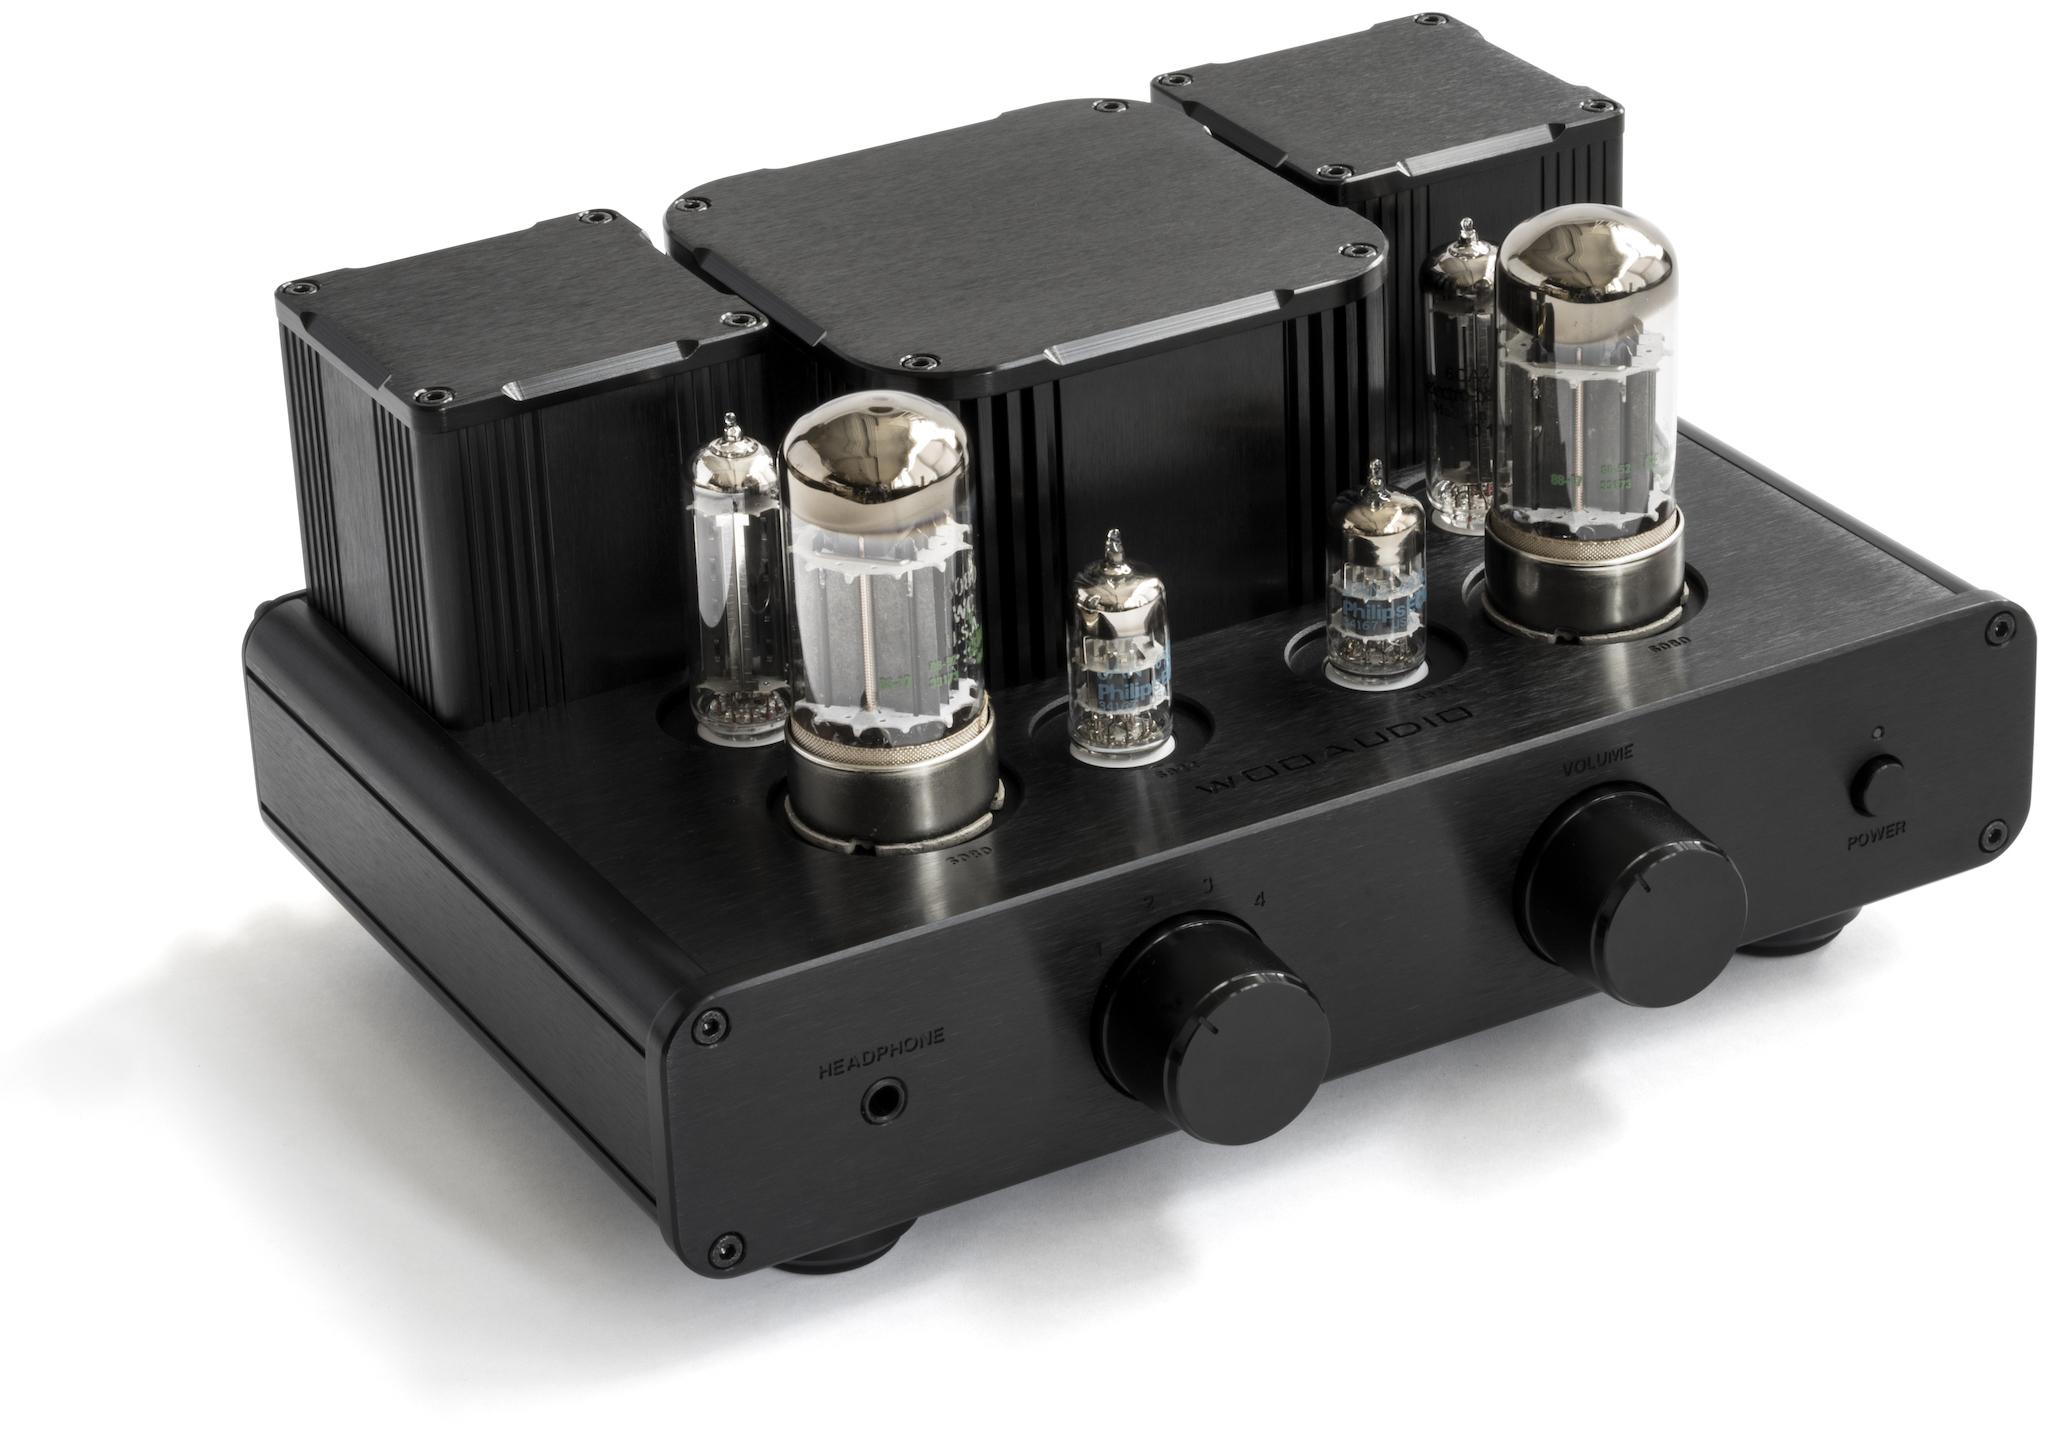 woo-audio-wa2-headphone-amplifier-black-highend-audiophile-vacuum-tube-headfi-tubeamp-6080-6922-6as7-tubes